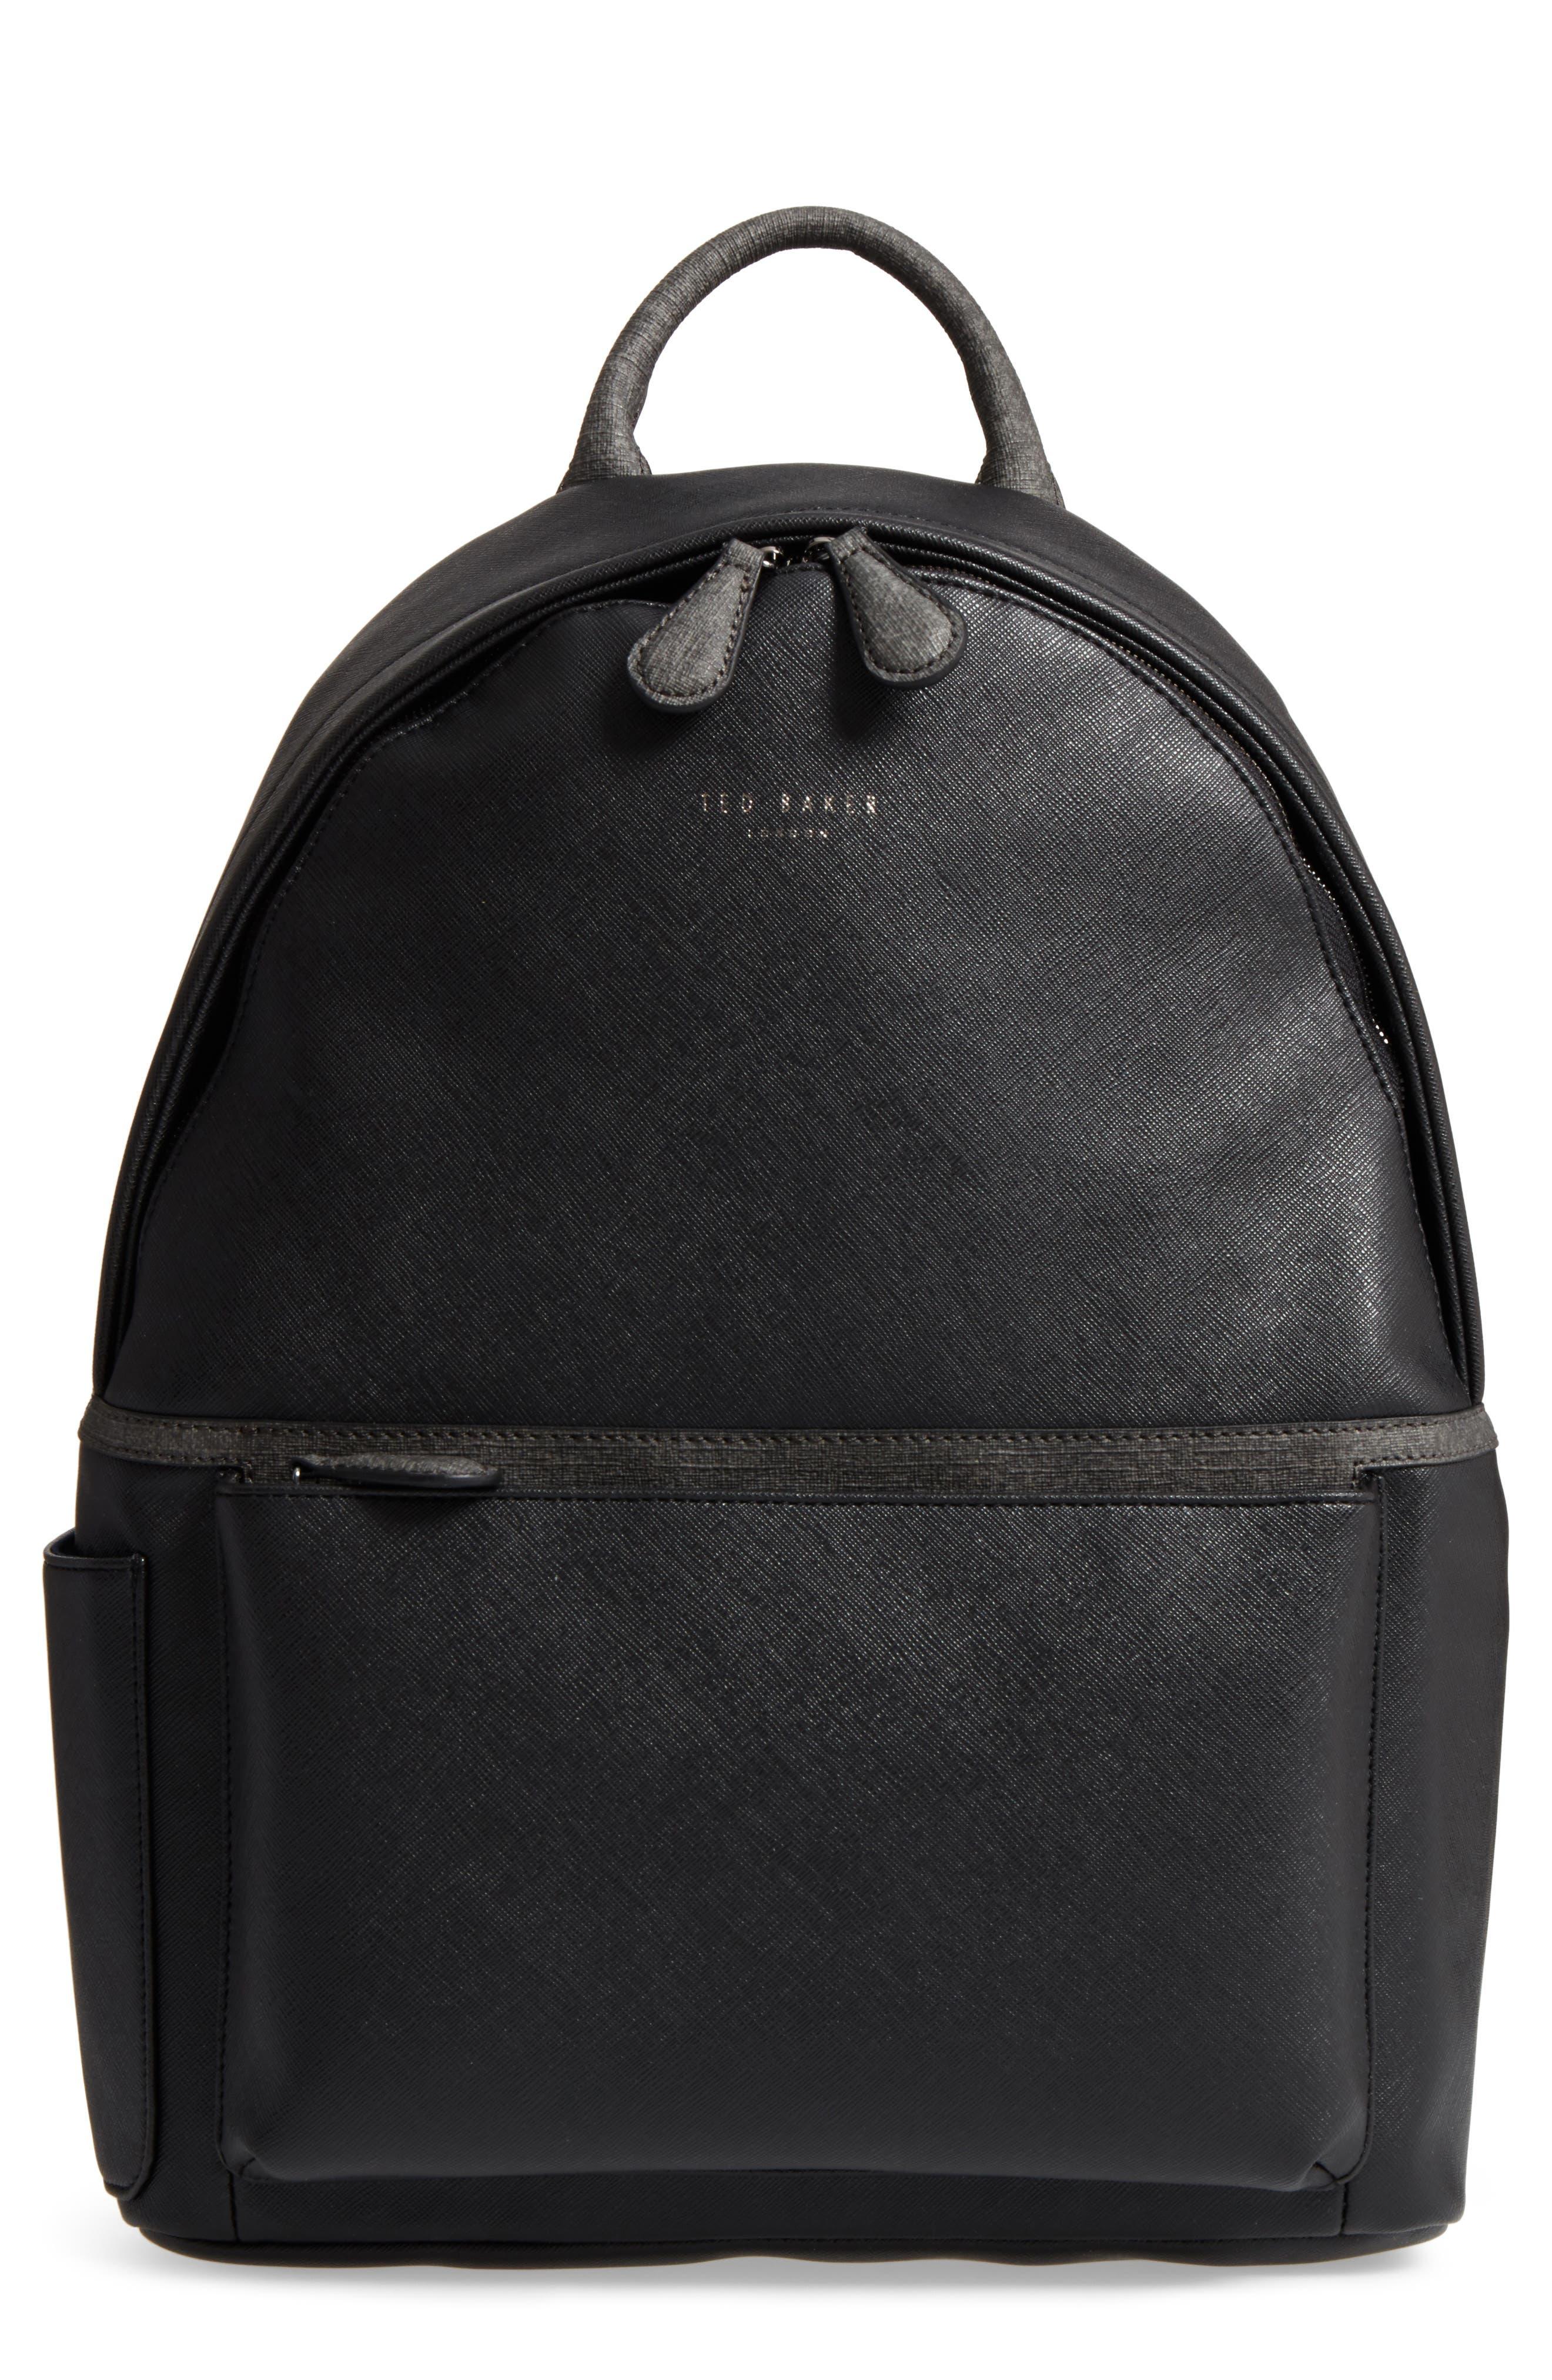 Ted Baker London Fangs Backpack